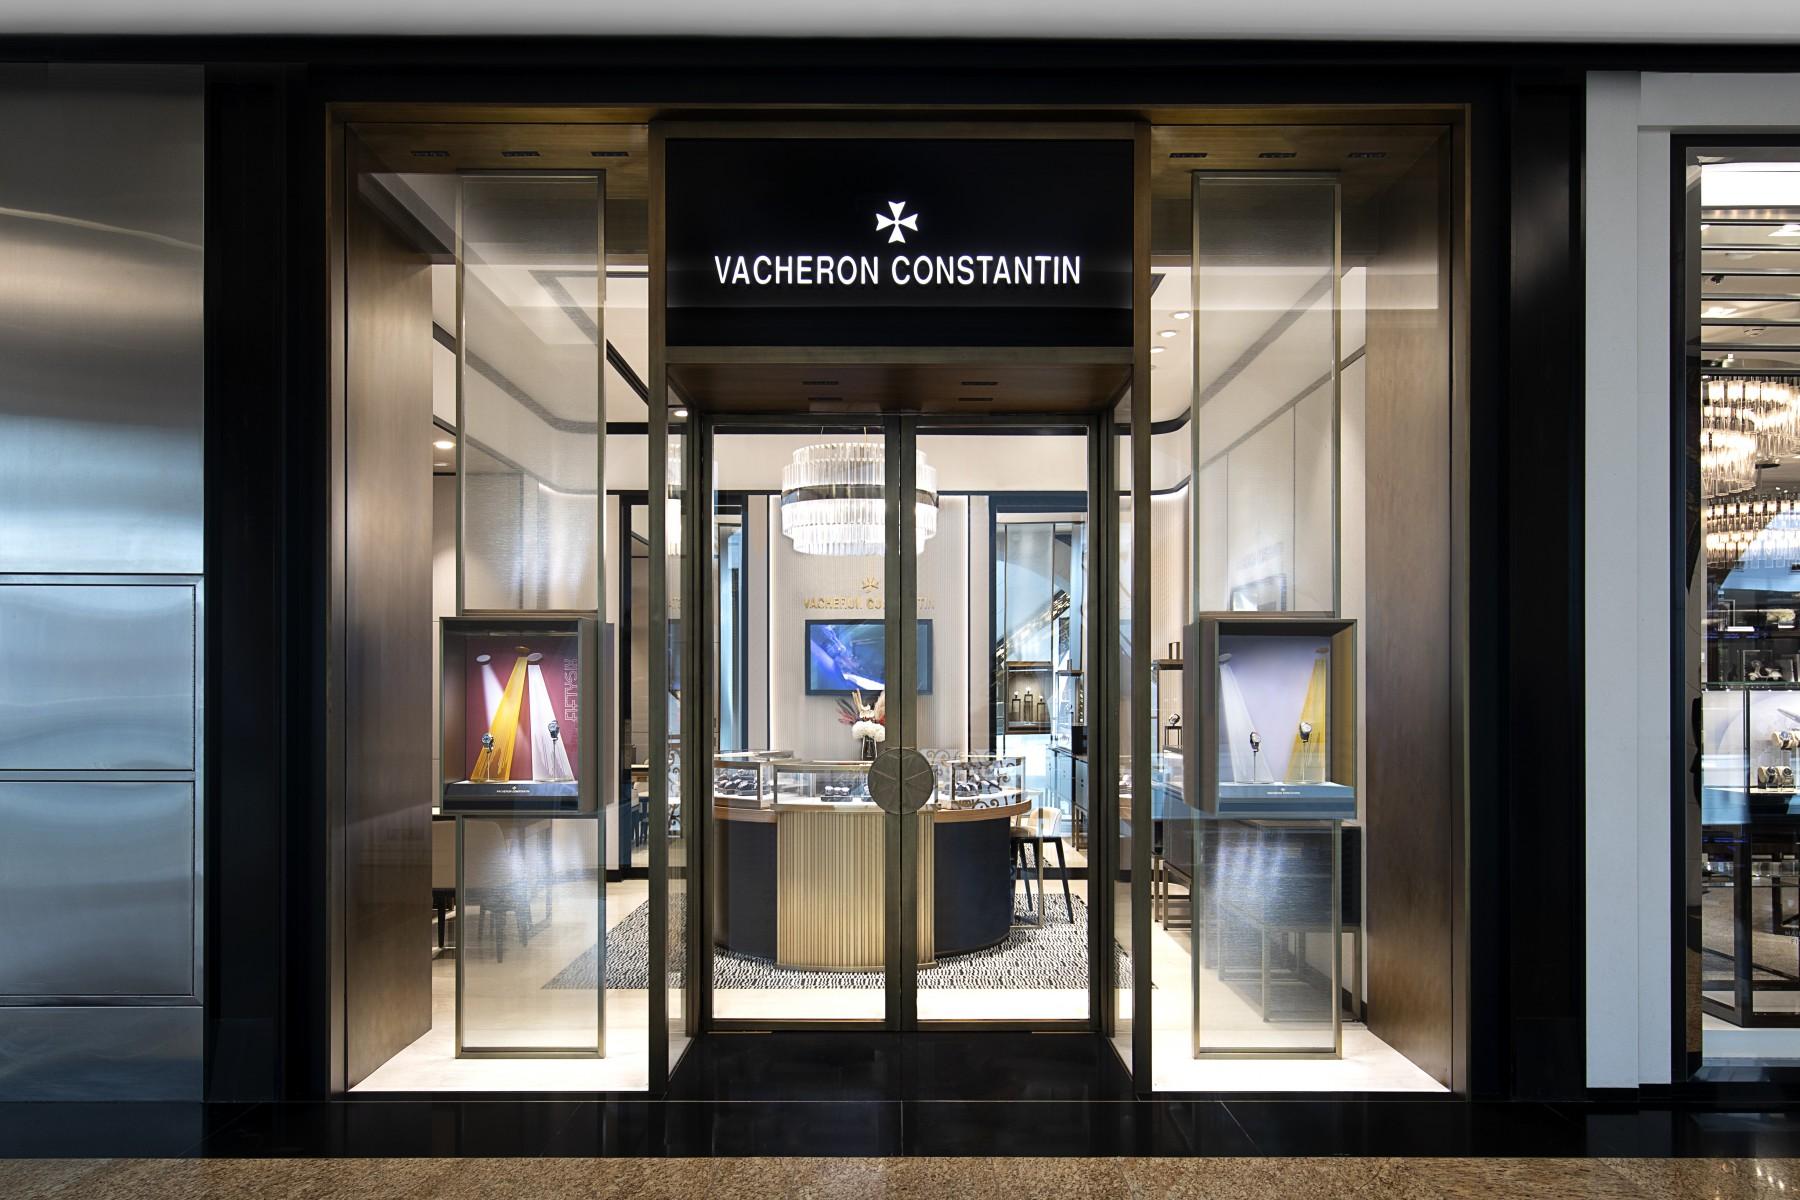 Vacheron Constantin new store Dubai at Mall of Emirates